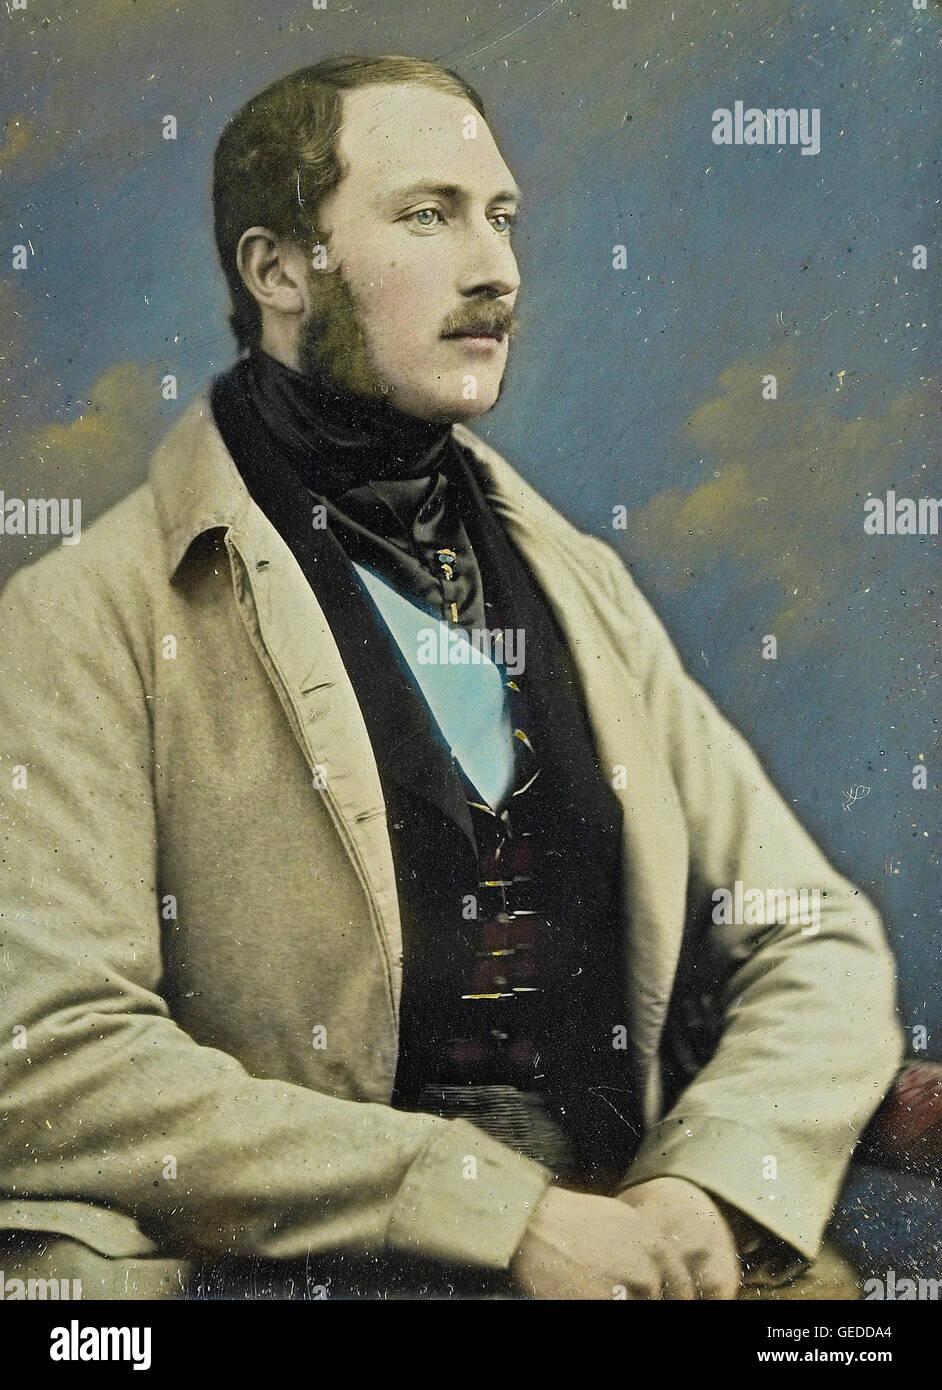 William Edward Kilburn - Prince Albert (1819-61) - Stock Image